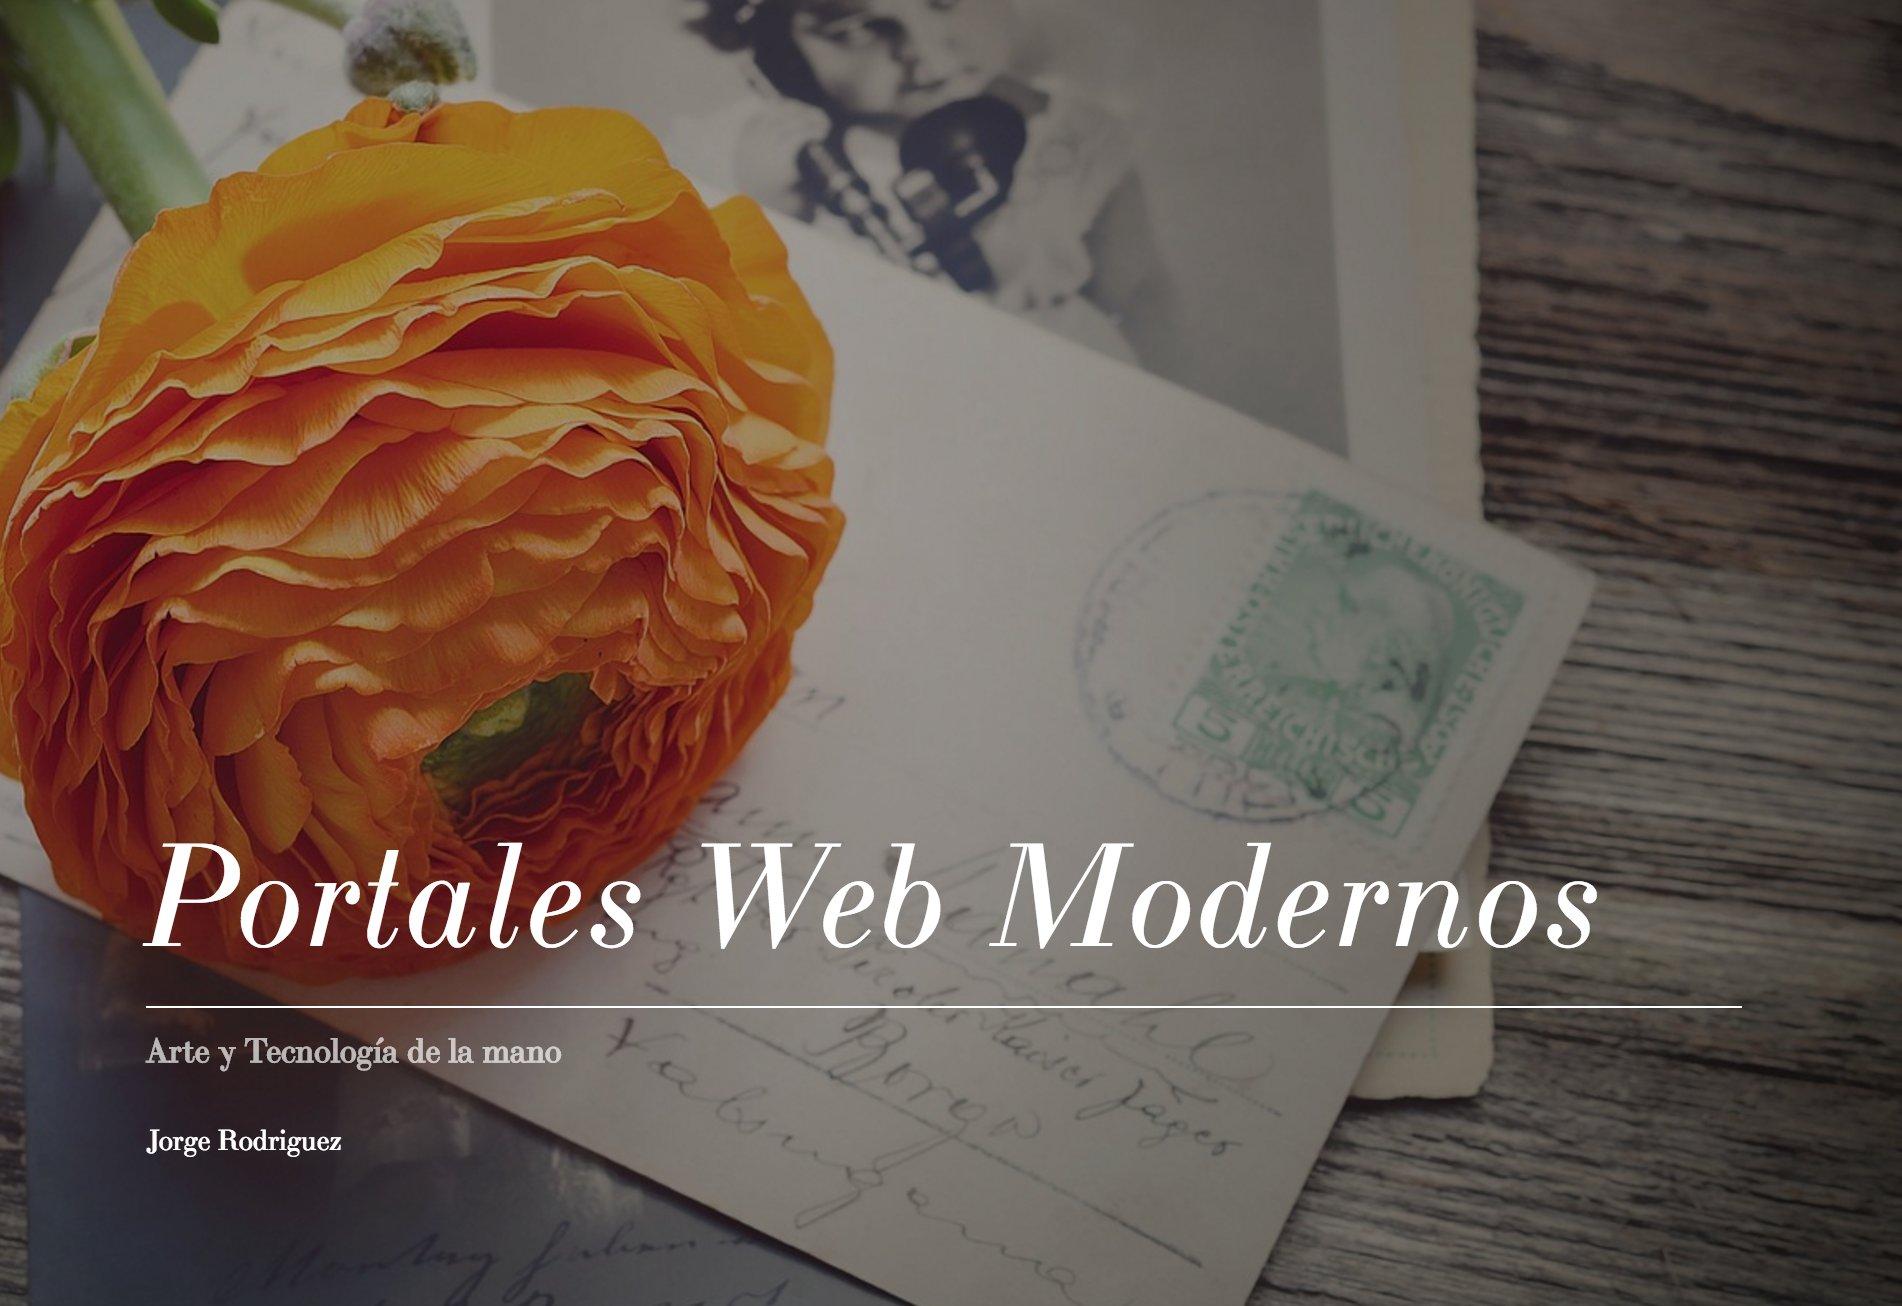 Portales Web Modernos